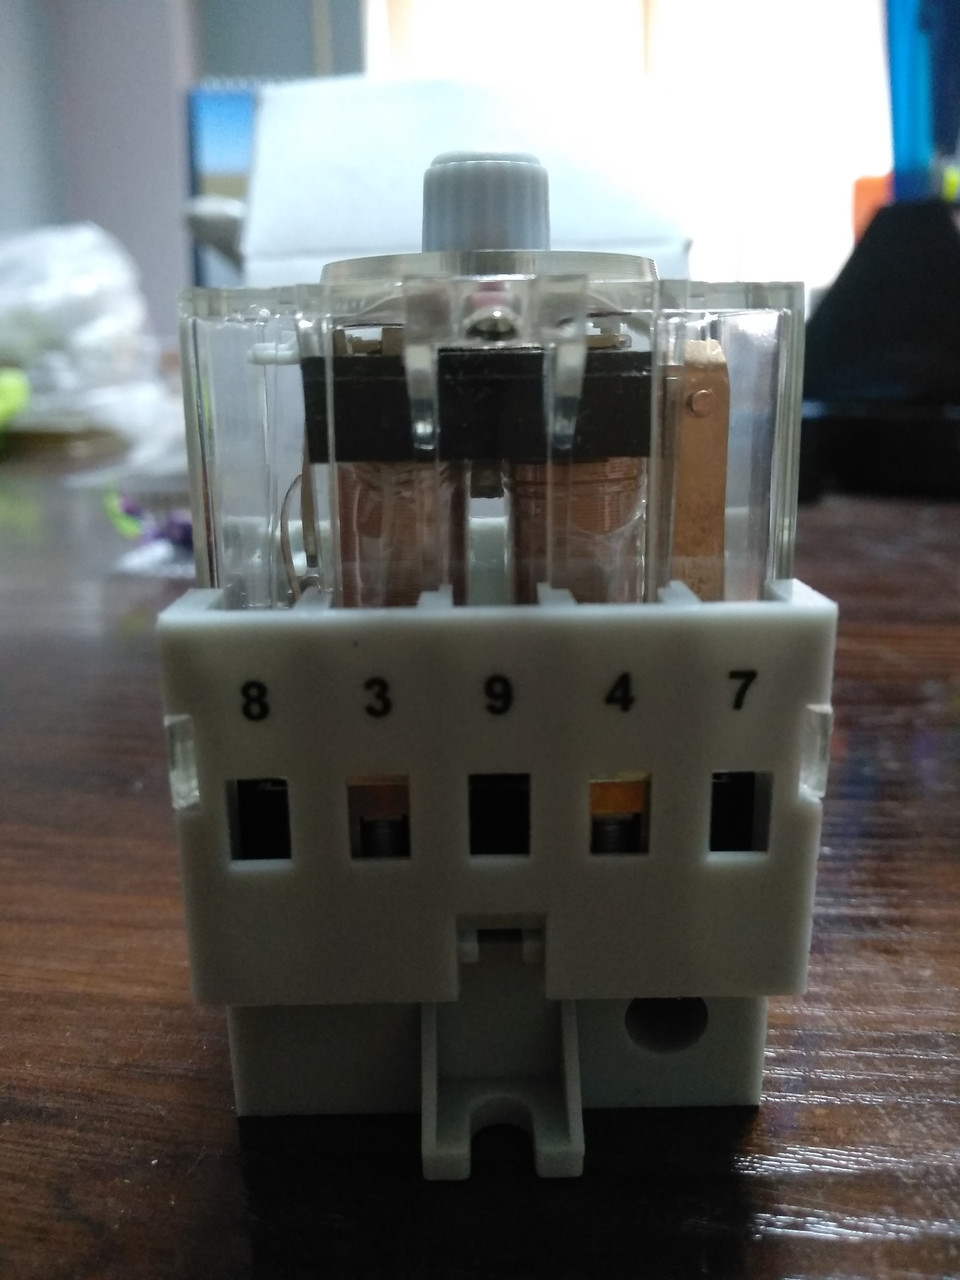 Реле РЭПУ-12М-101 220В переменный ток,   замена РЭУ-11-11, РУ-21, ПРУ-1-11